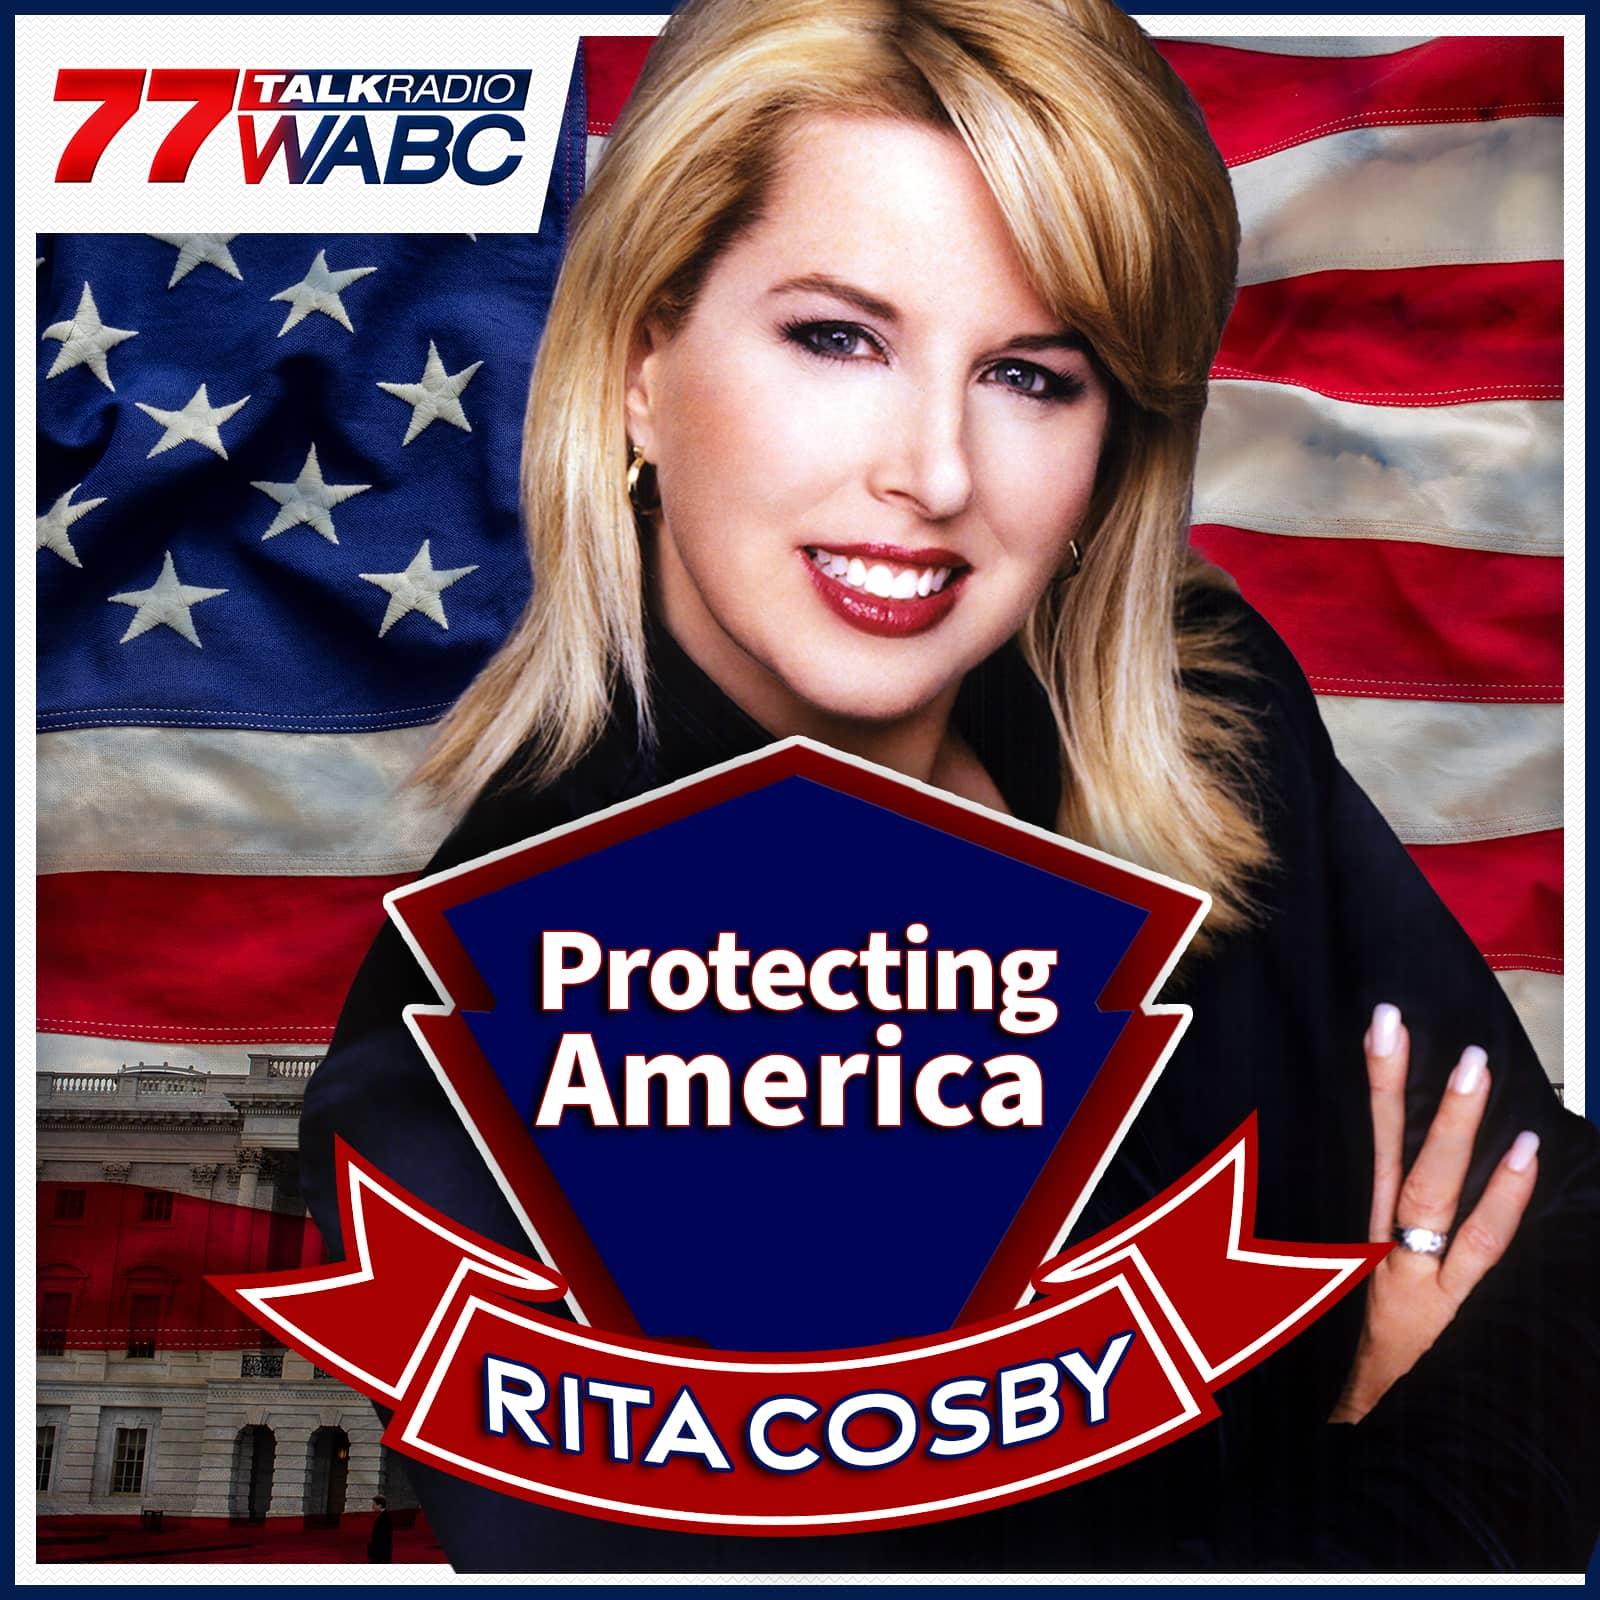 Protecting America Rita Cosby